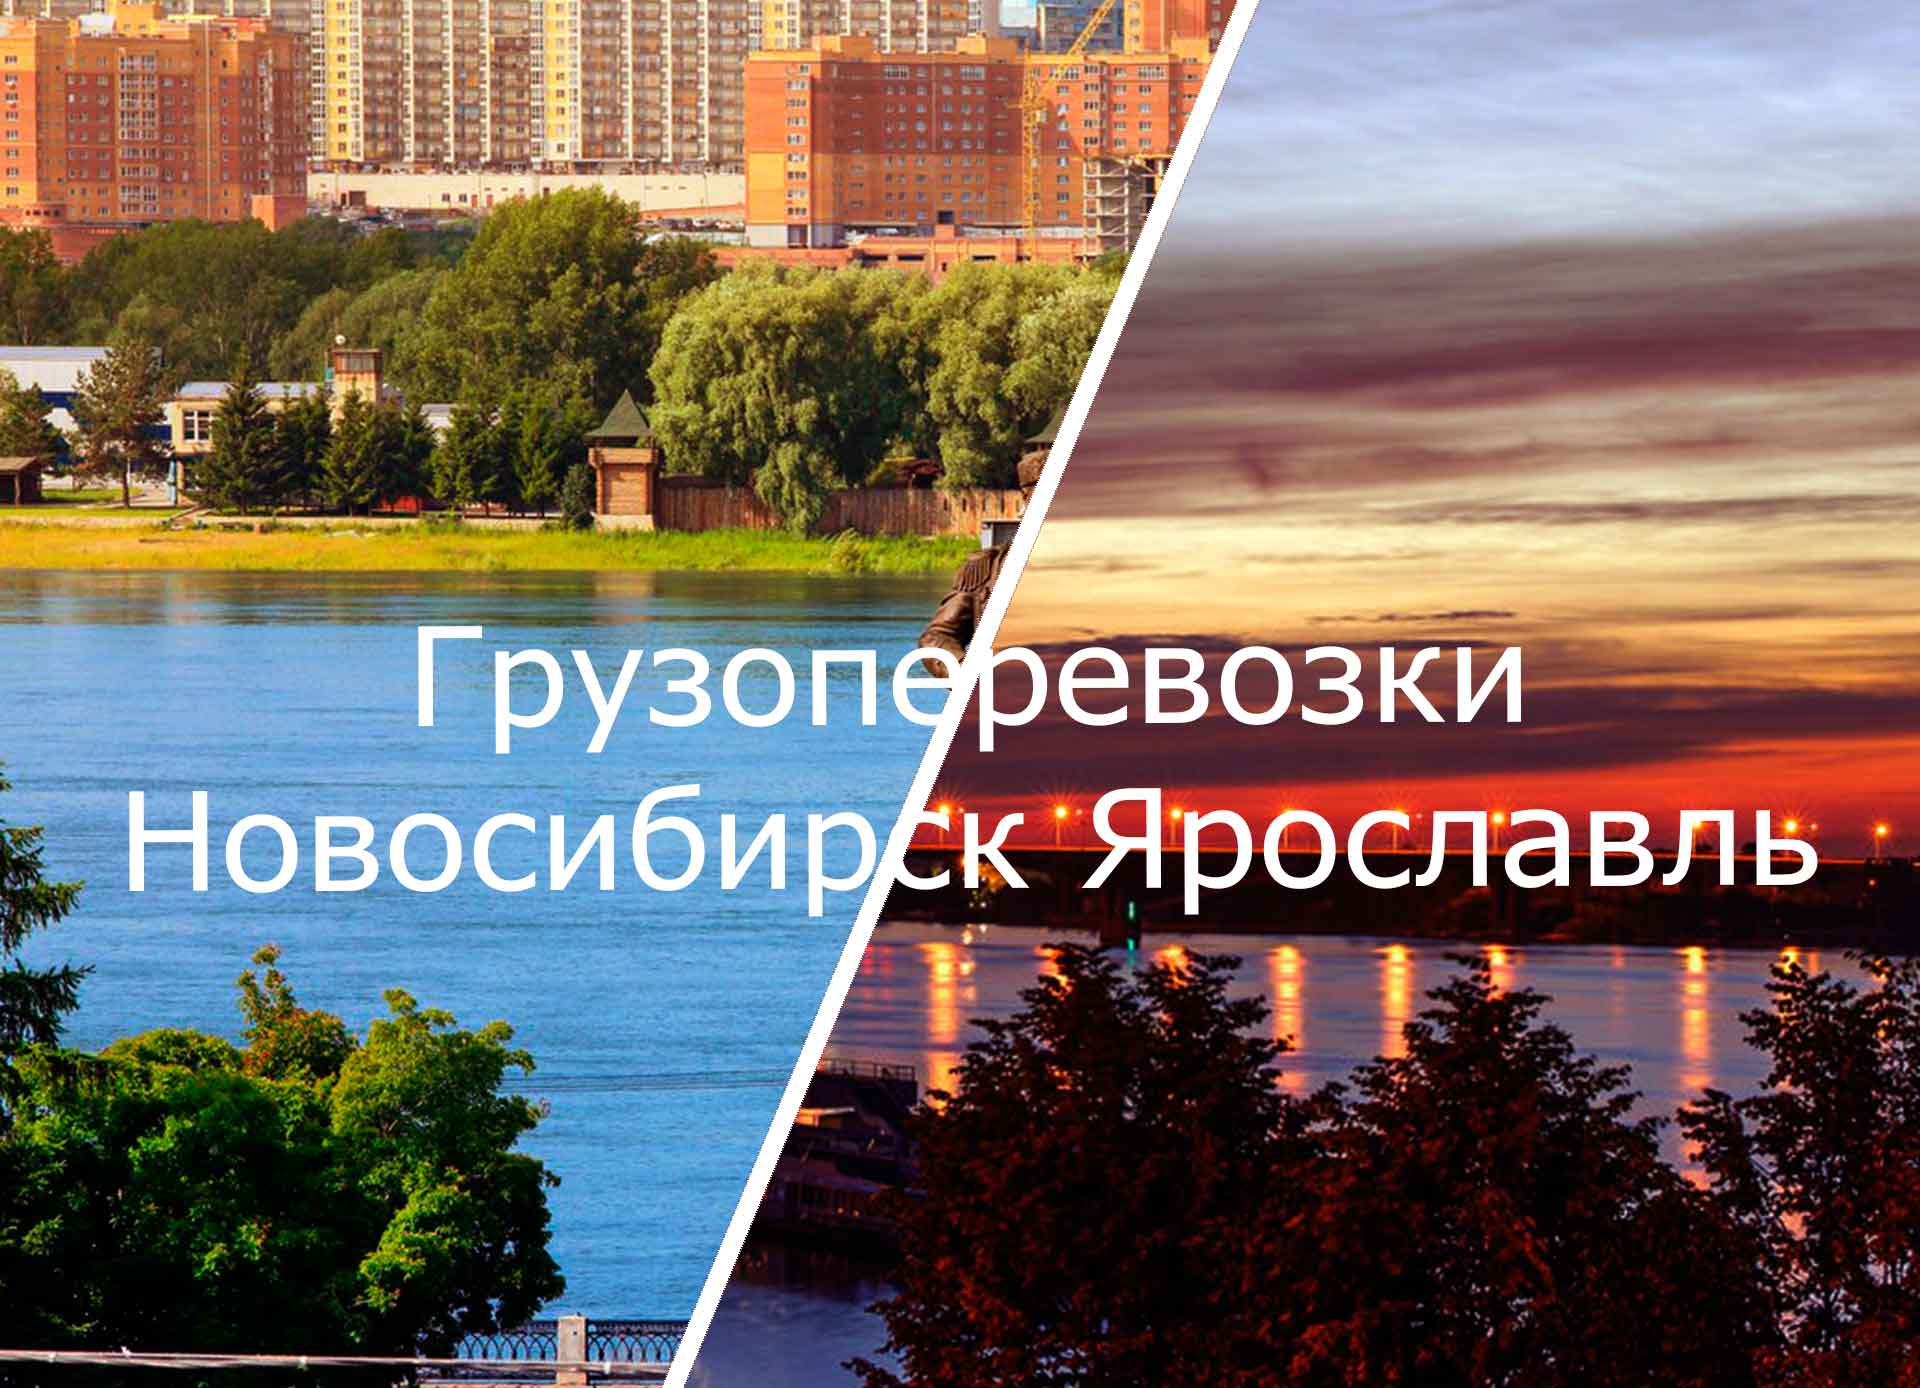 грузоперевозки новосибирск ярославль